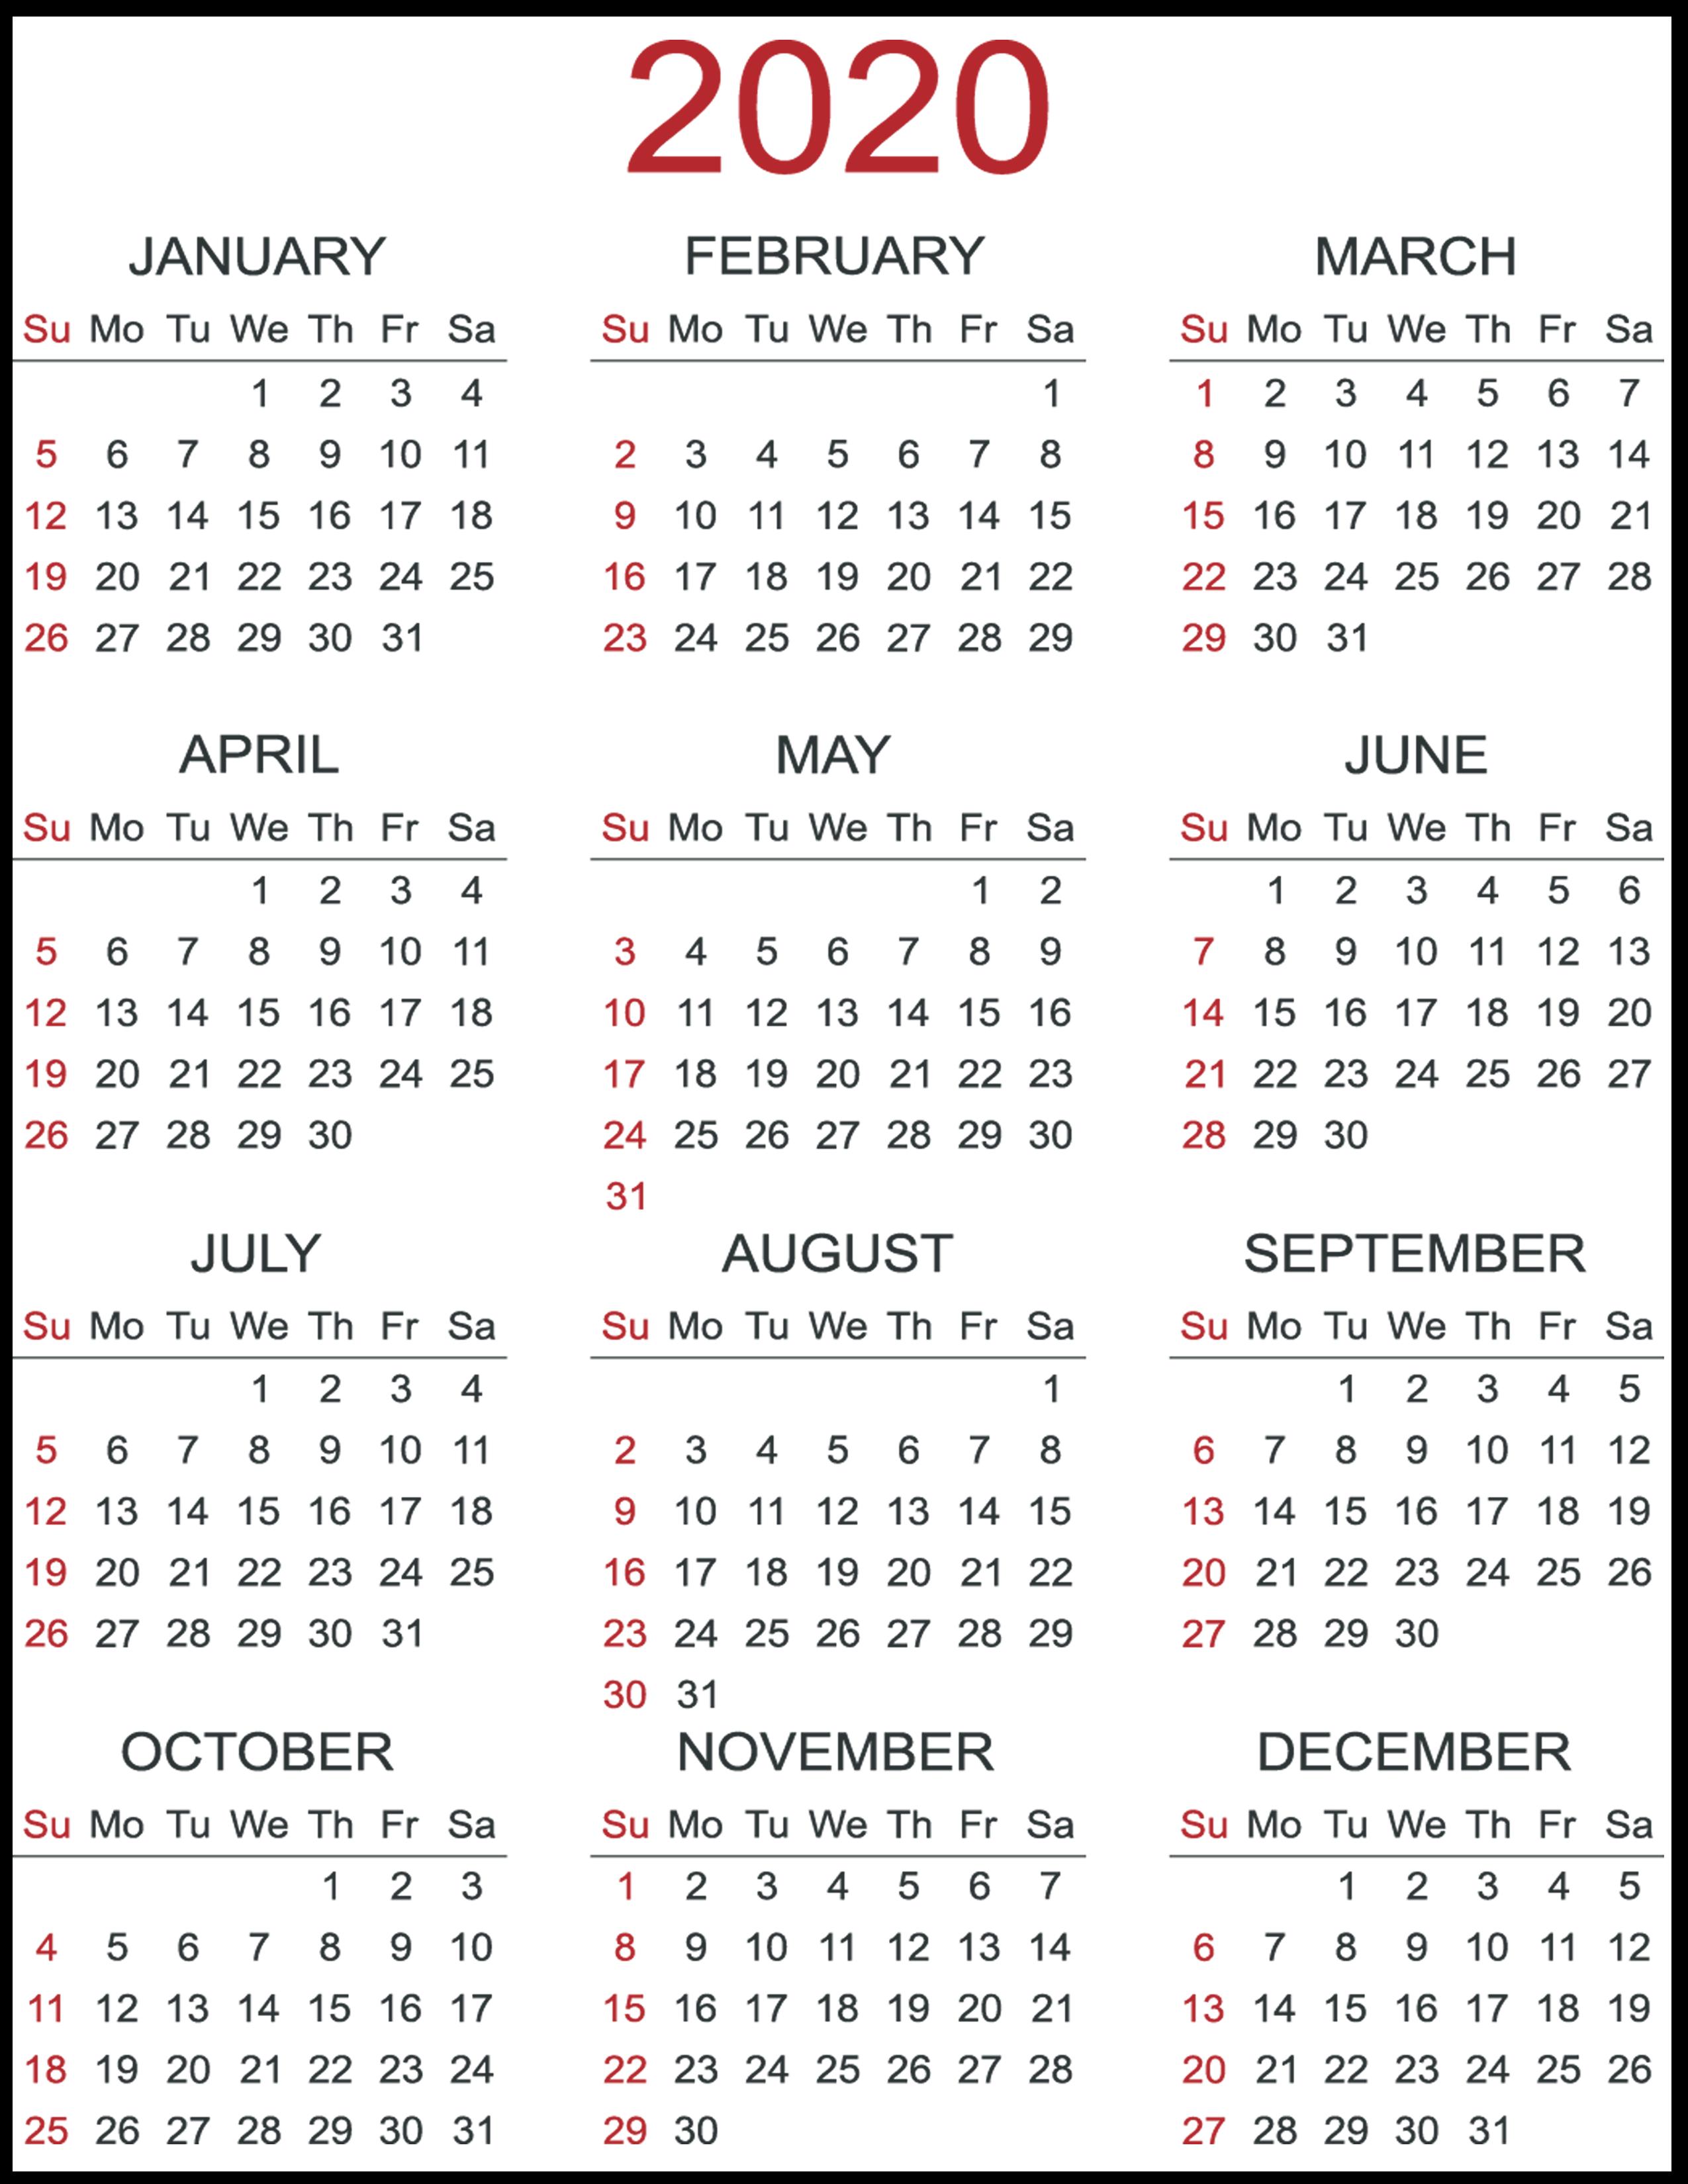 Free Calendar Template 2020 Excel  Bolan.horizonconsulting.co inside Calendar Excel Template 2020